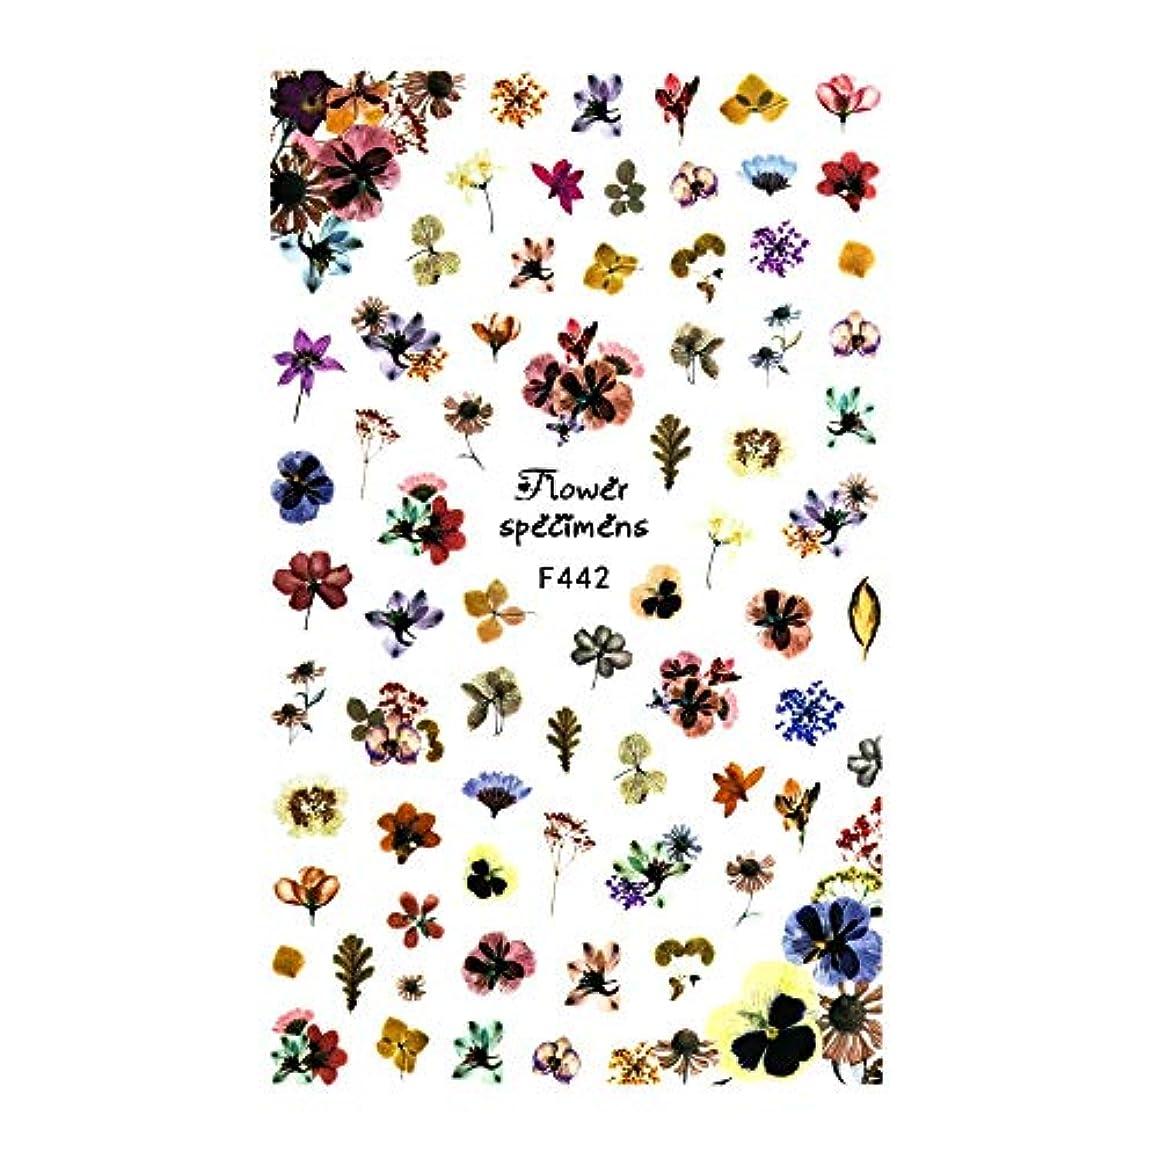 irogel イロジェル ネイルシール アンティークドライフラワーシール【F442】花 フラワー ドライフラワー